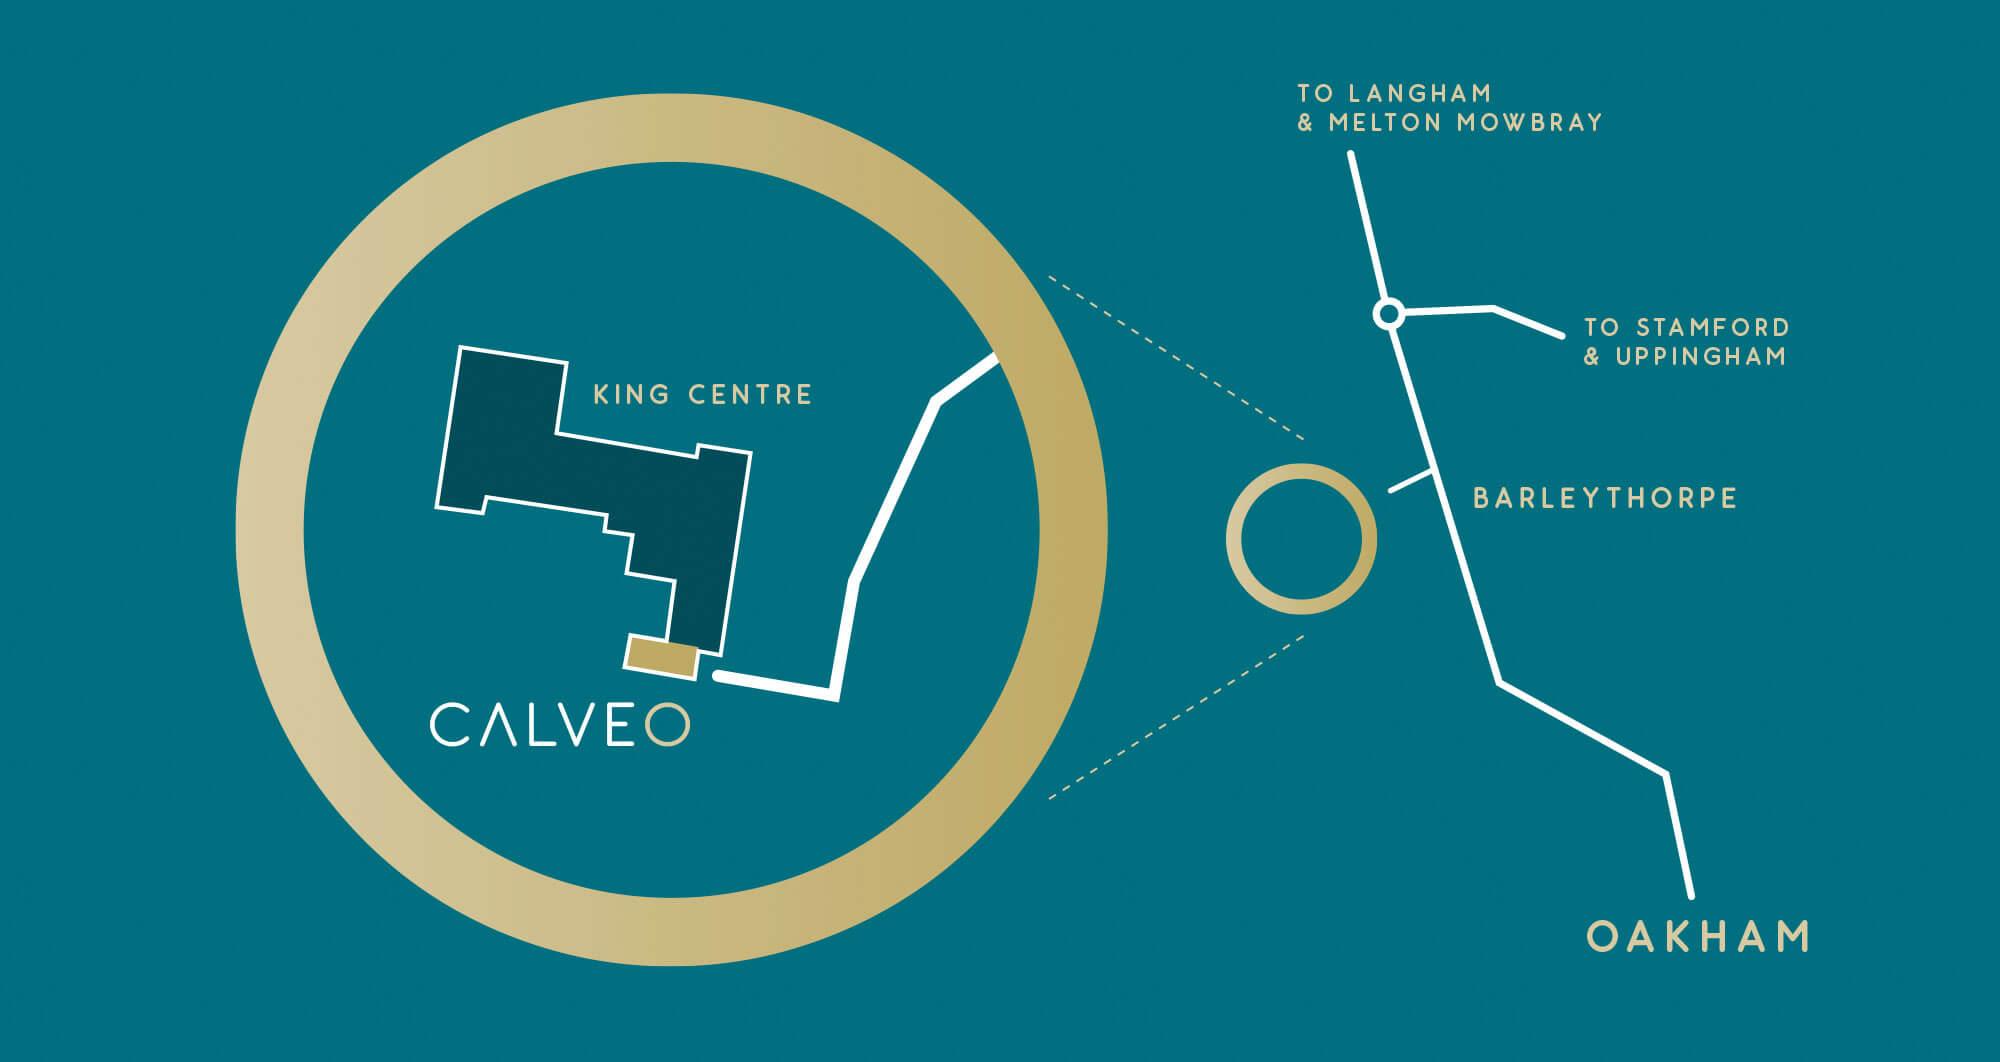 CALVEO map